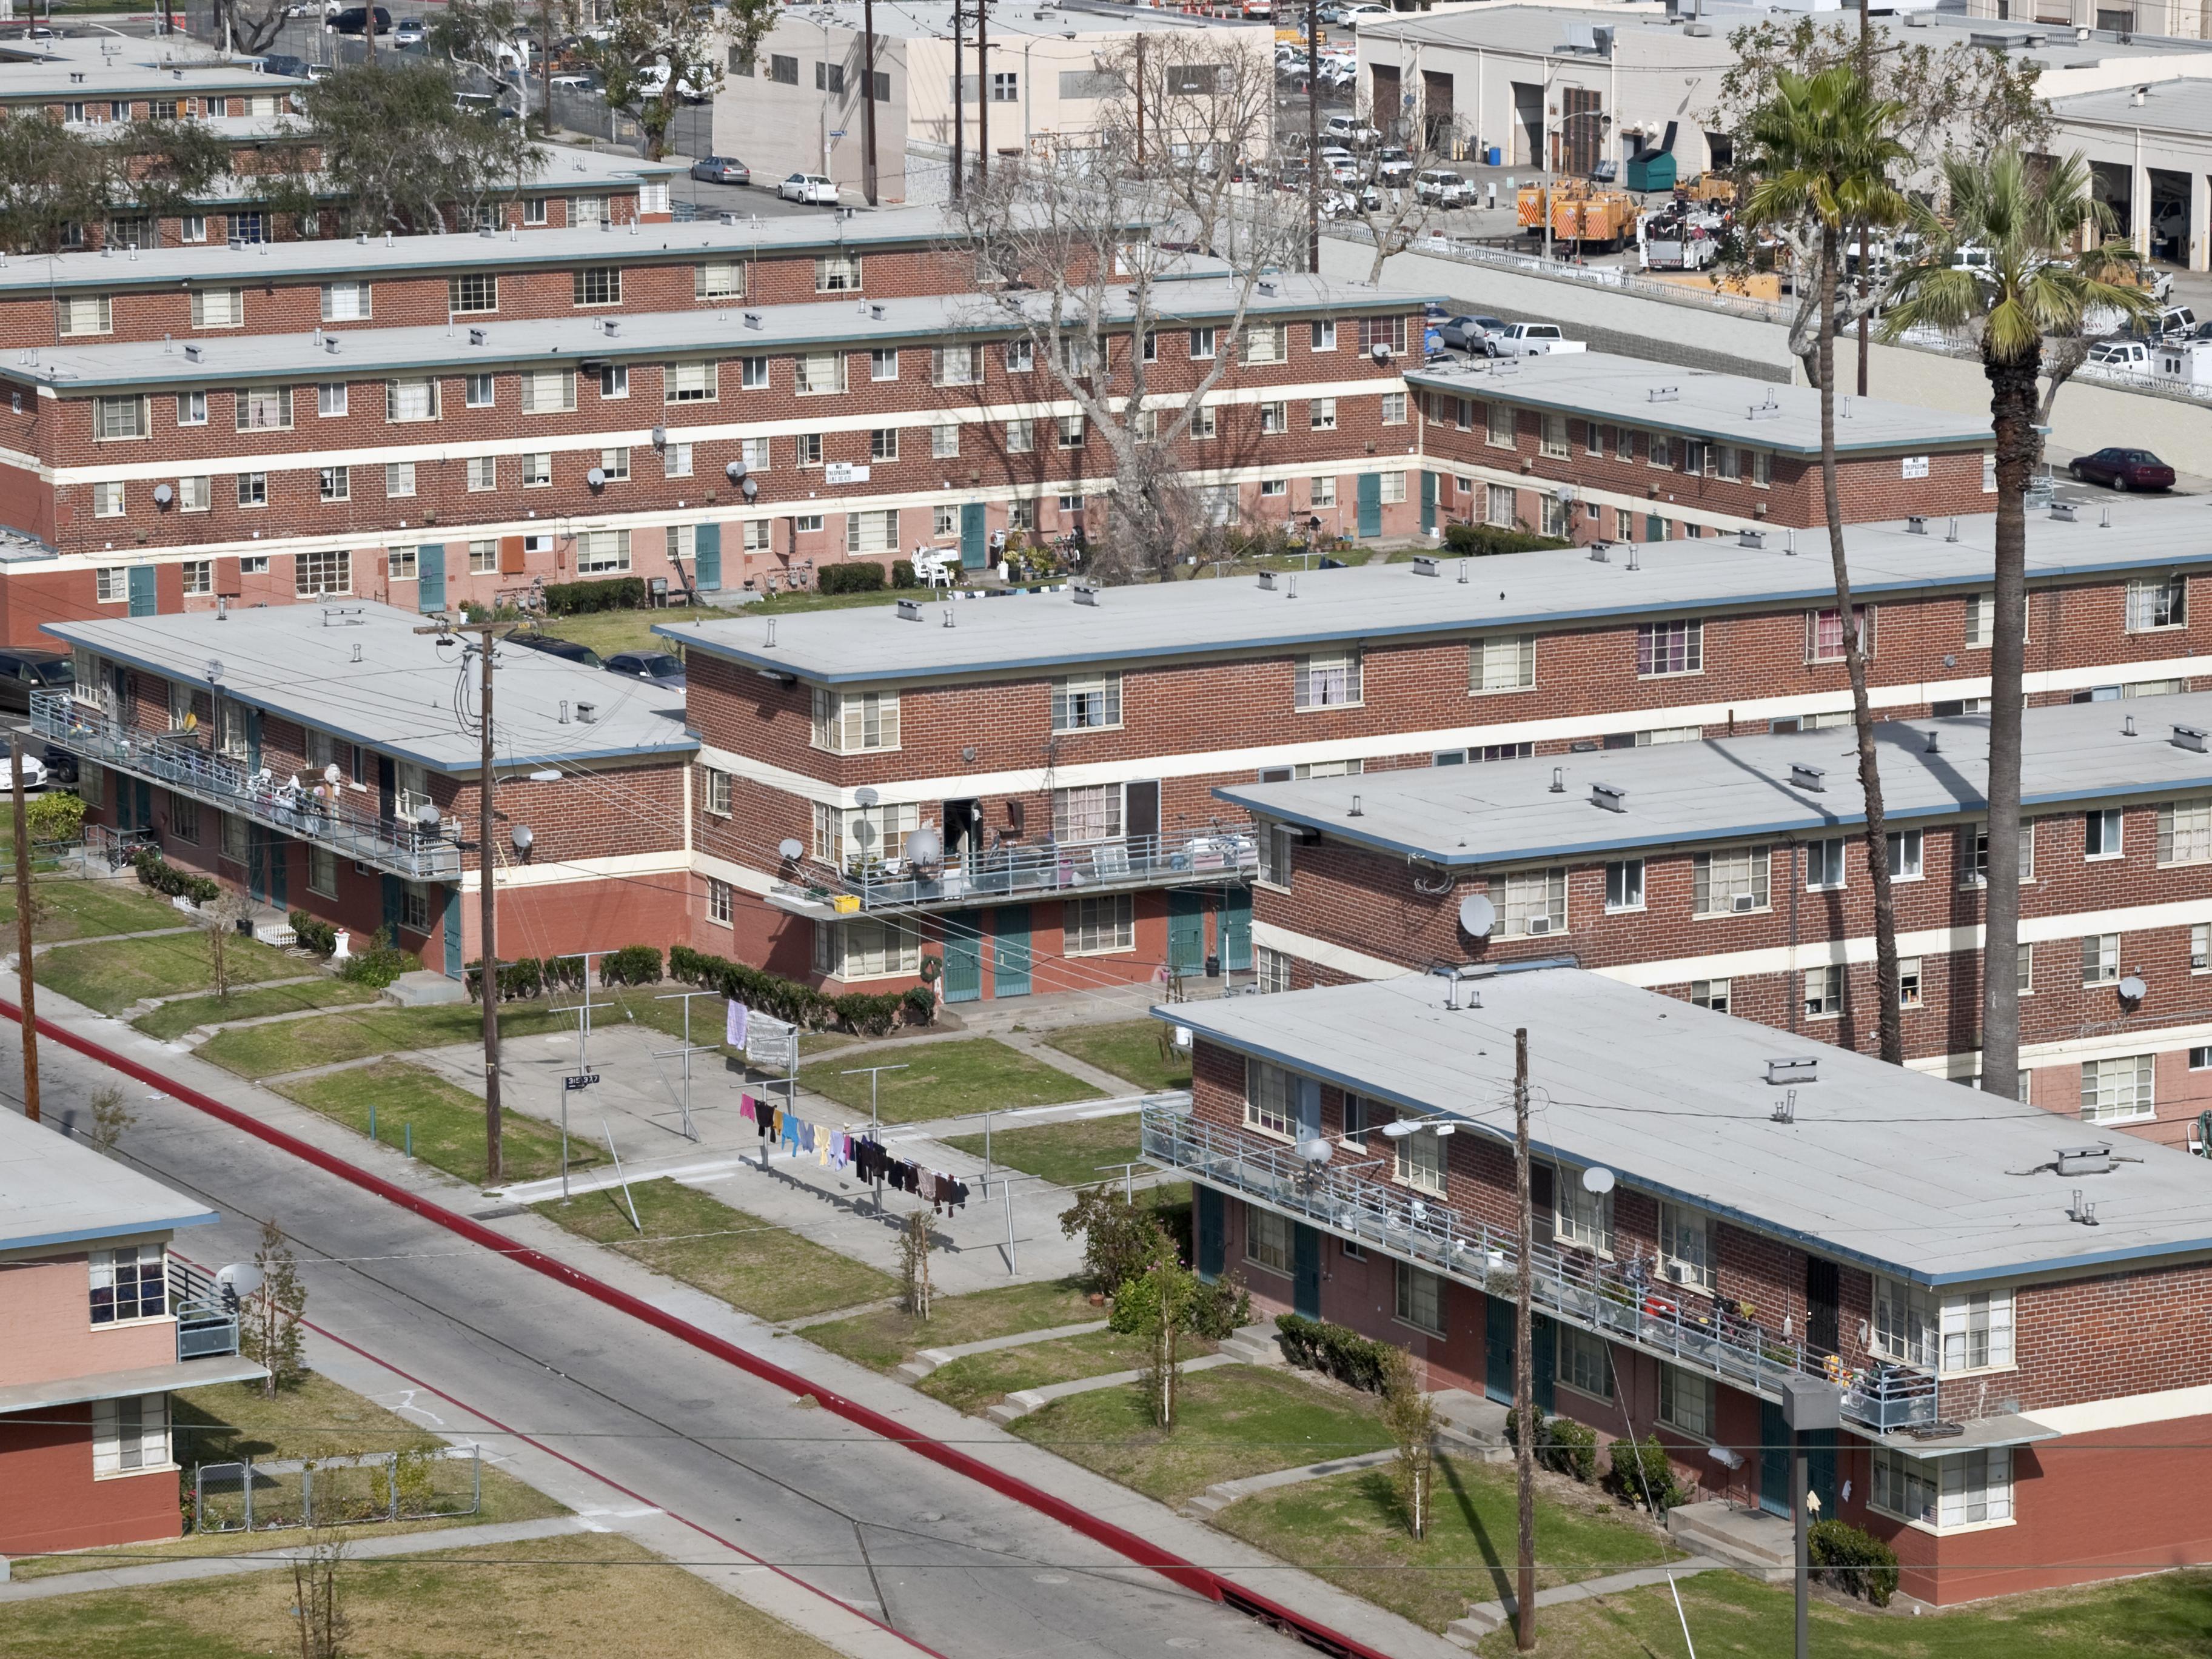 William Mead Homes public housing